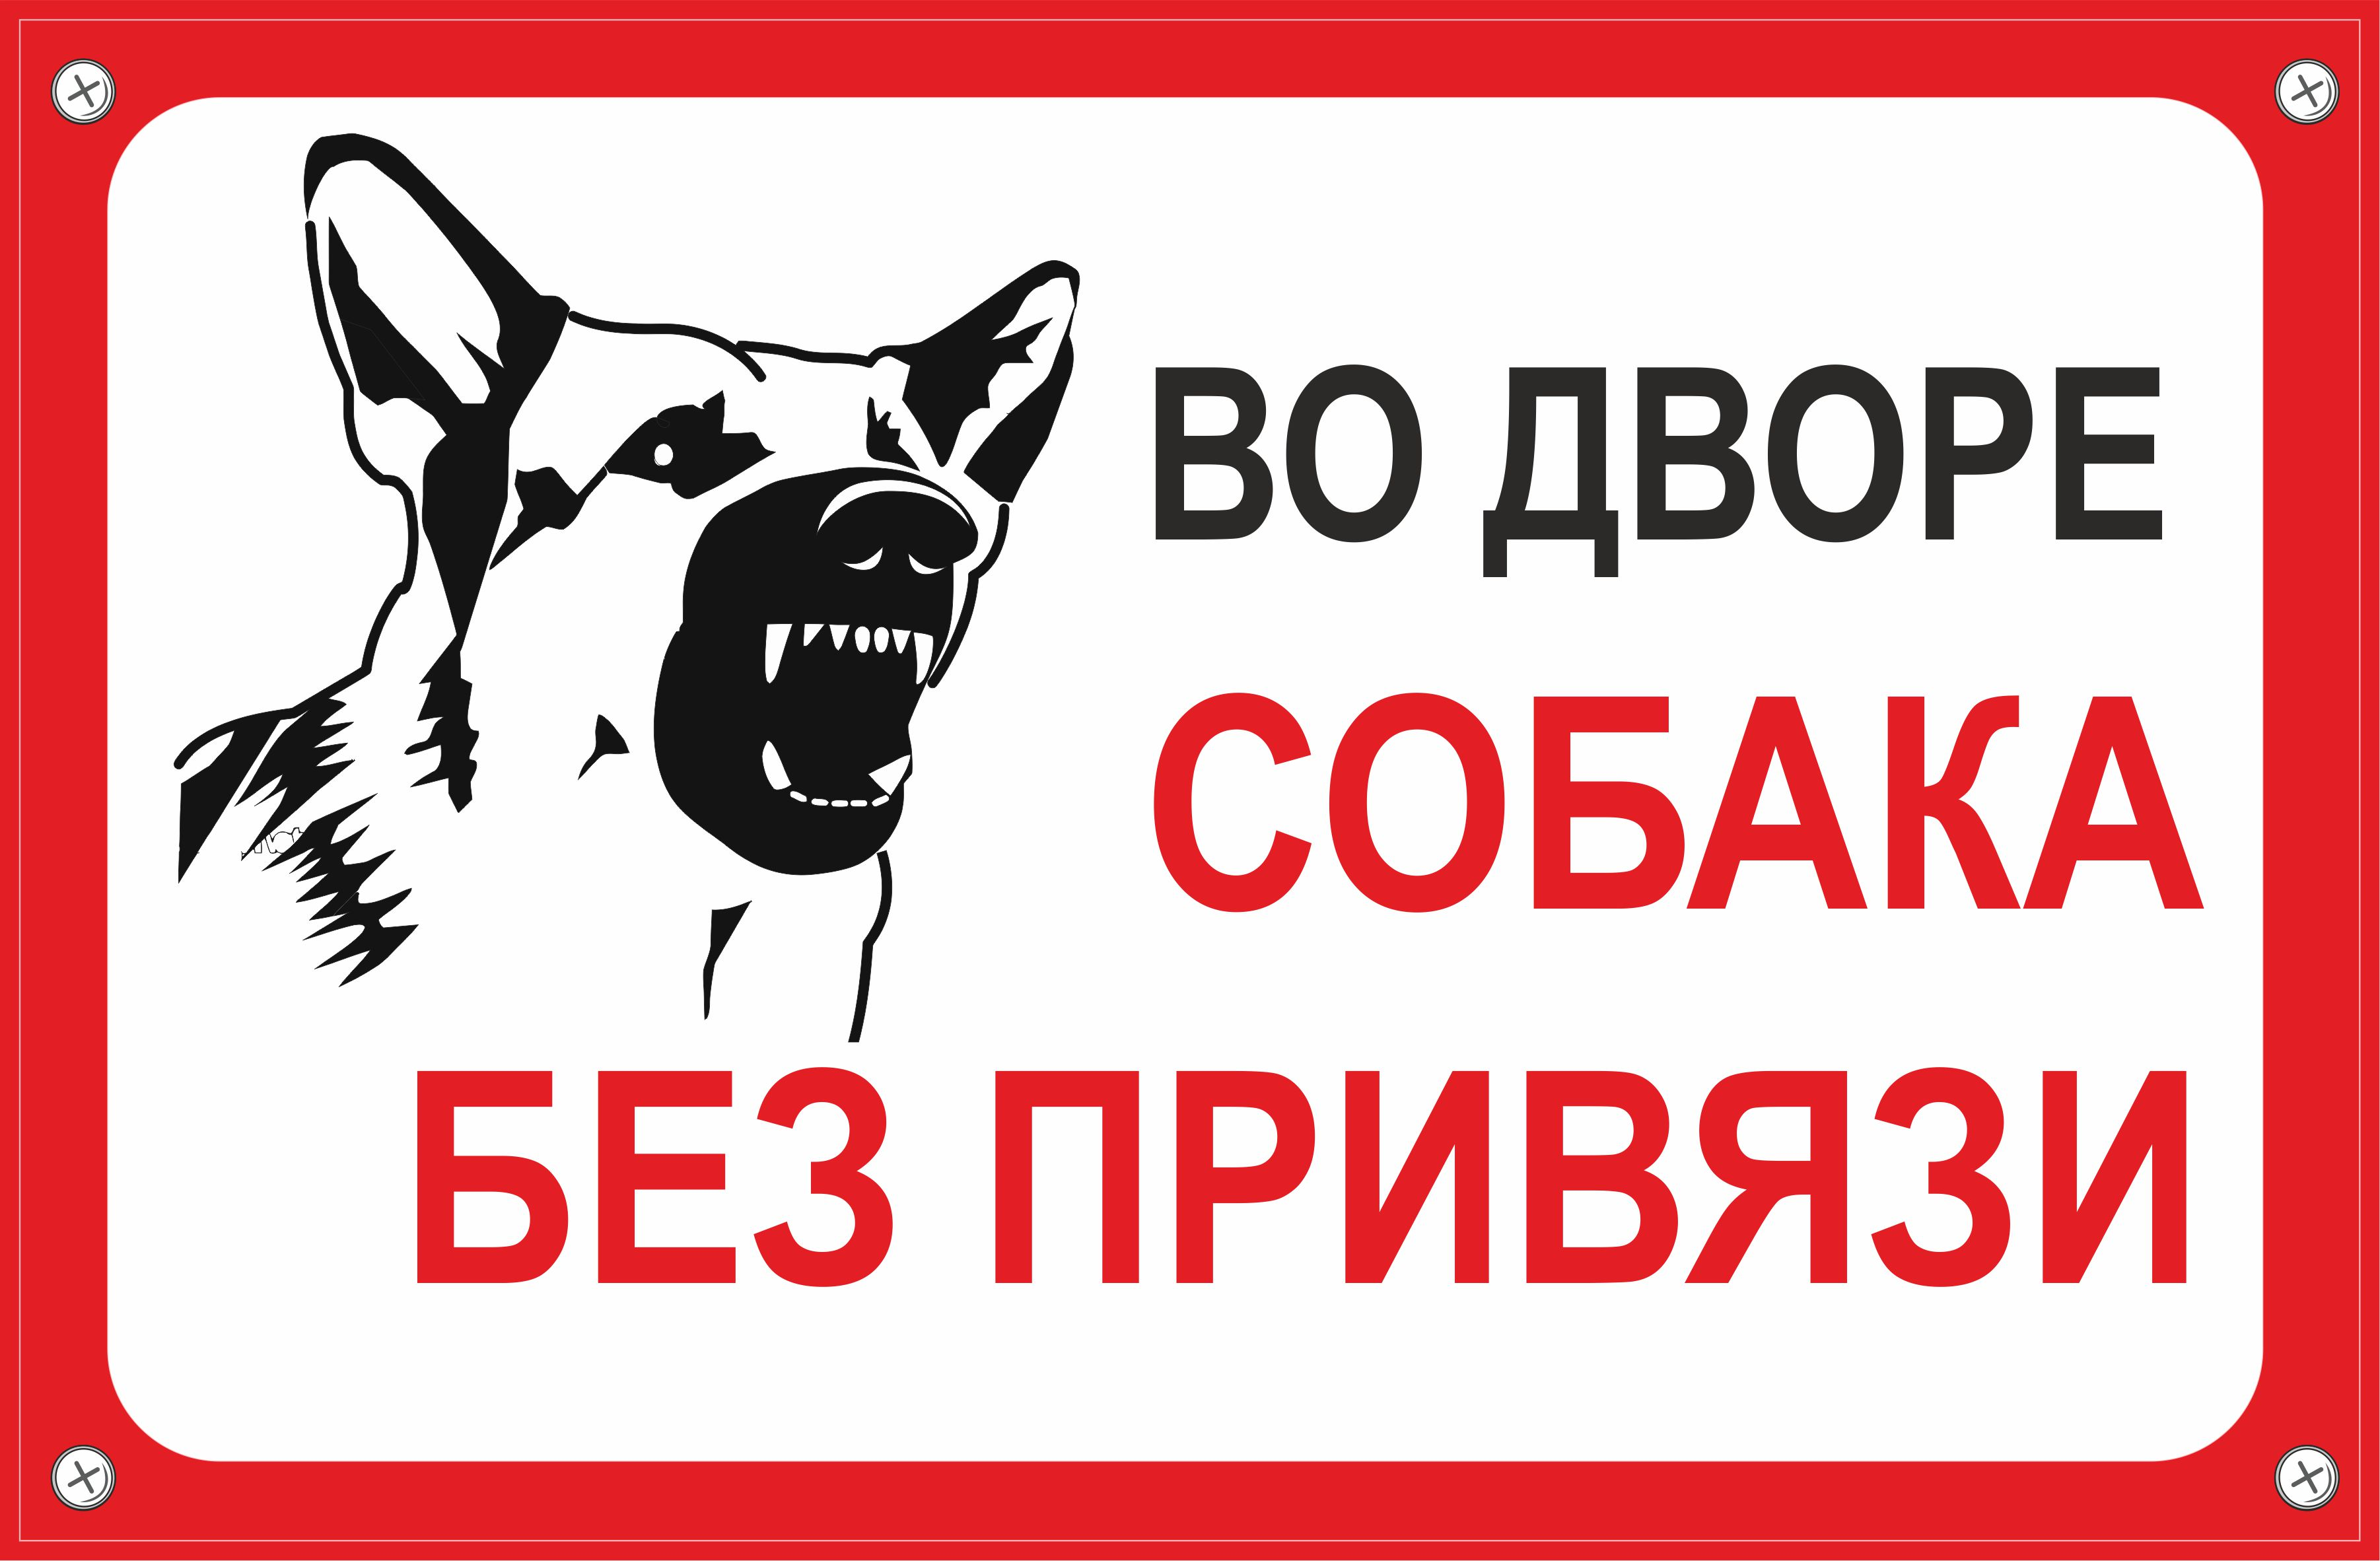 Табличка TPS 004 Собака без привязи, пластик 3 мм,30*19,5 см табличка tps 004 собака без привязи пластик 3 мм 30 19 5 см